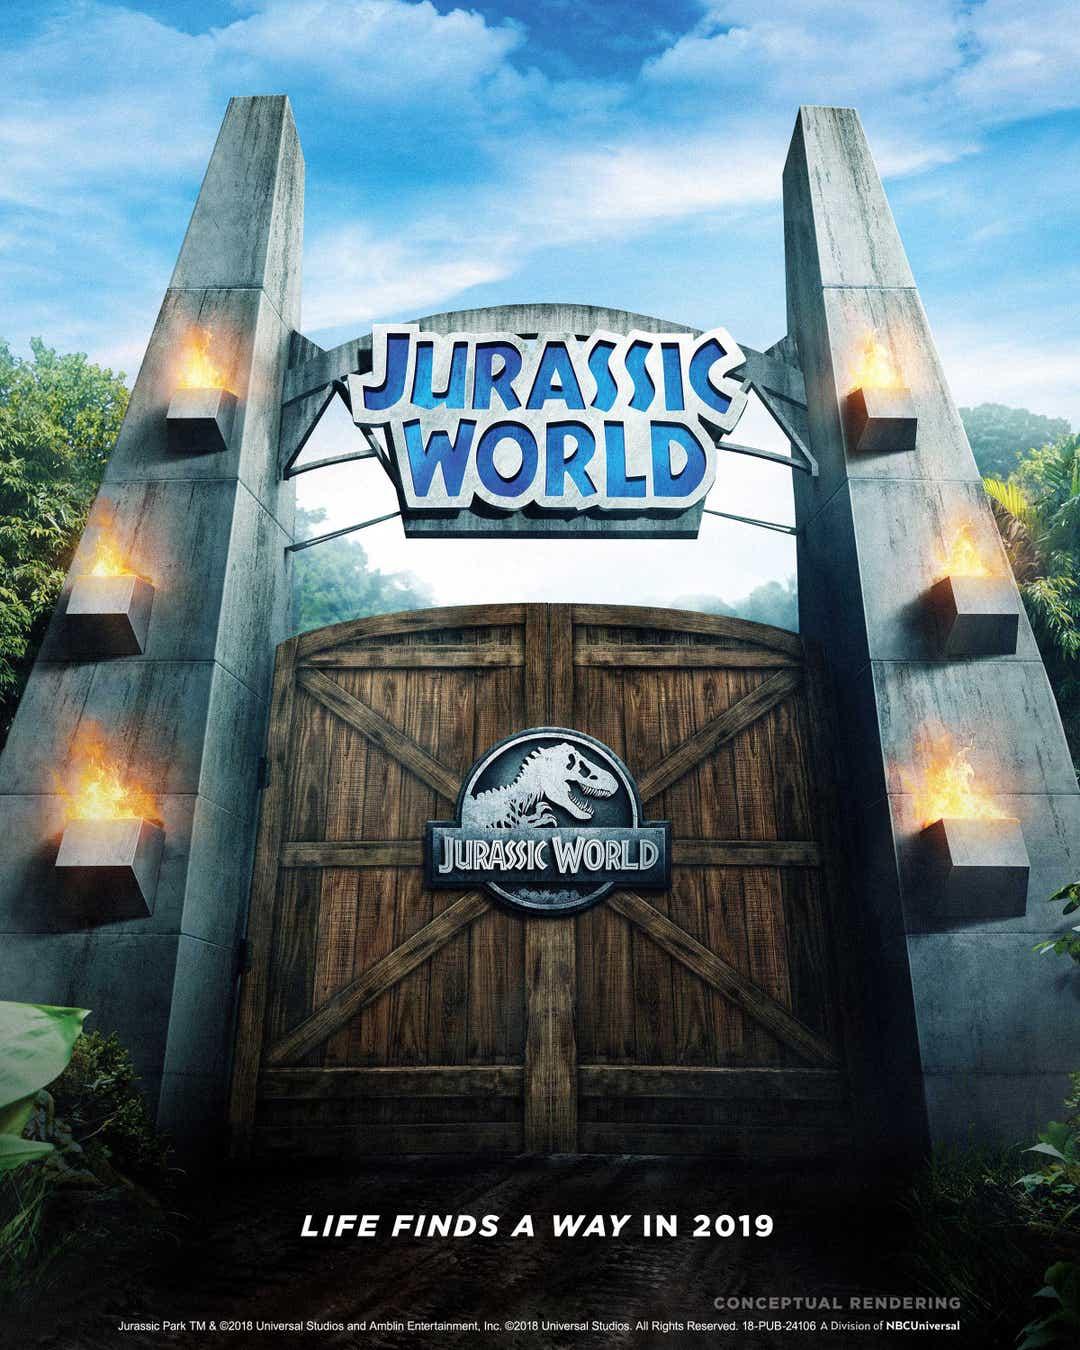 [USA] Universal Studios Hollywood (1964) - Page 20 636615558667401052-jurassic-world-ride